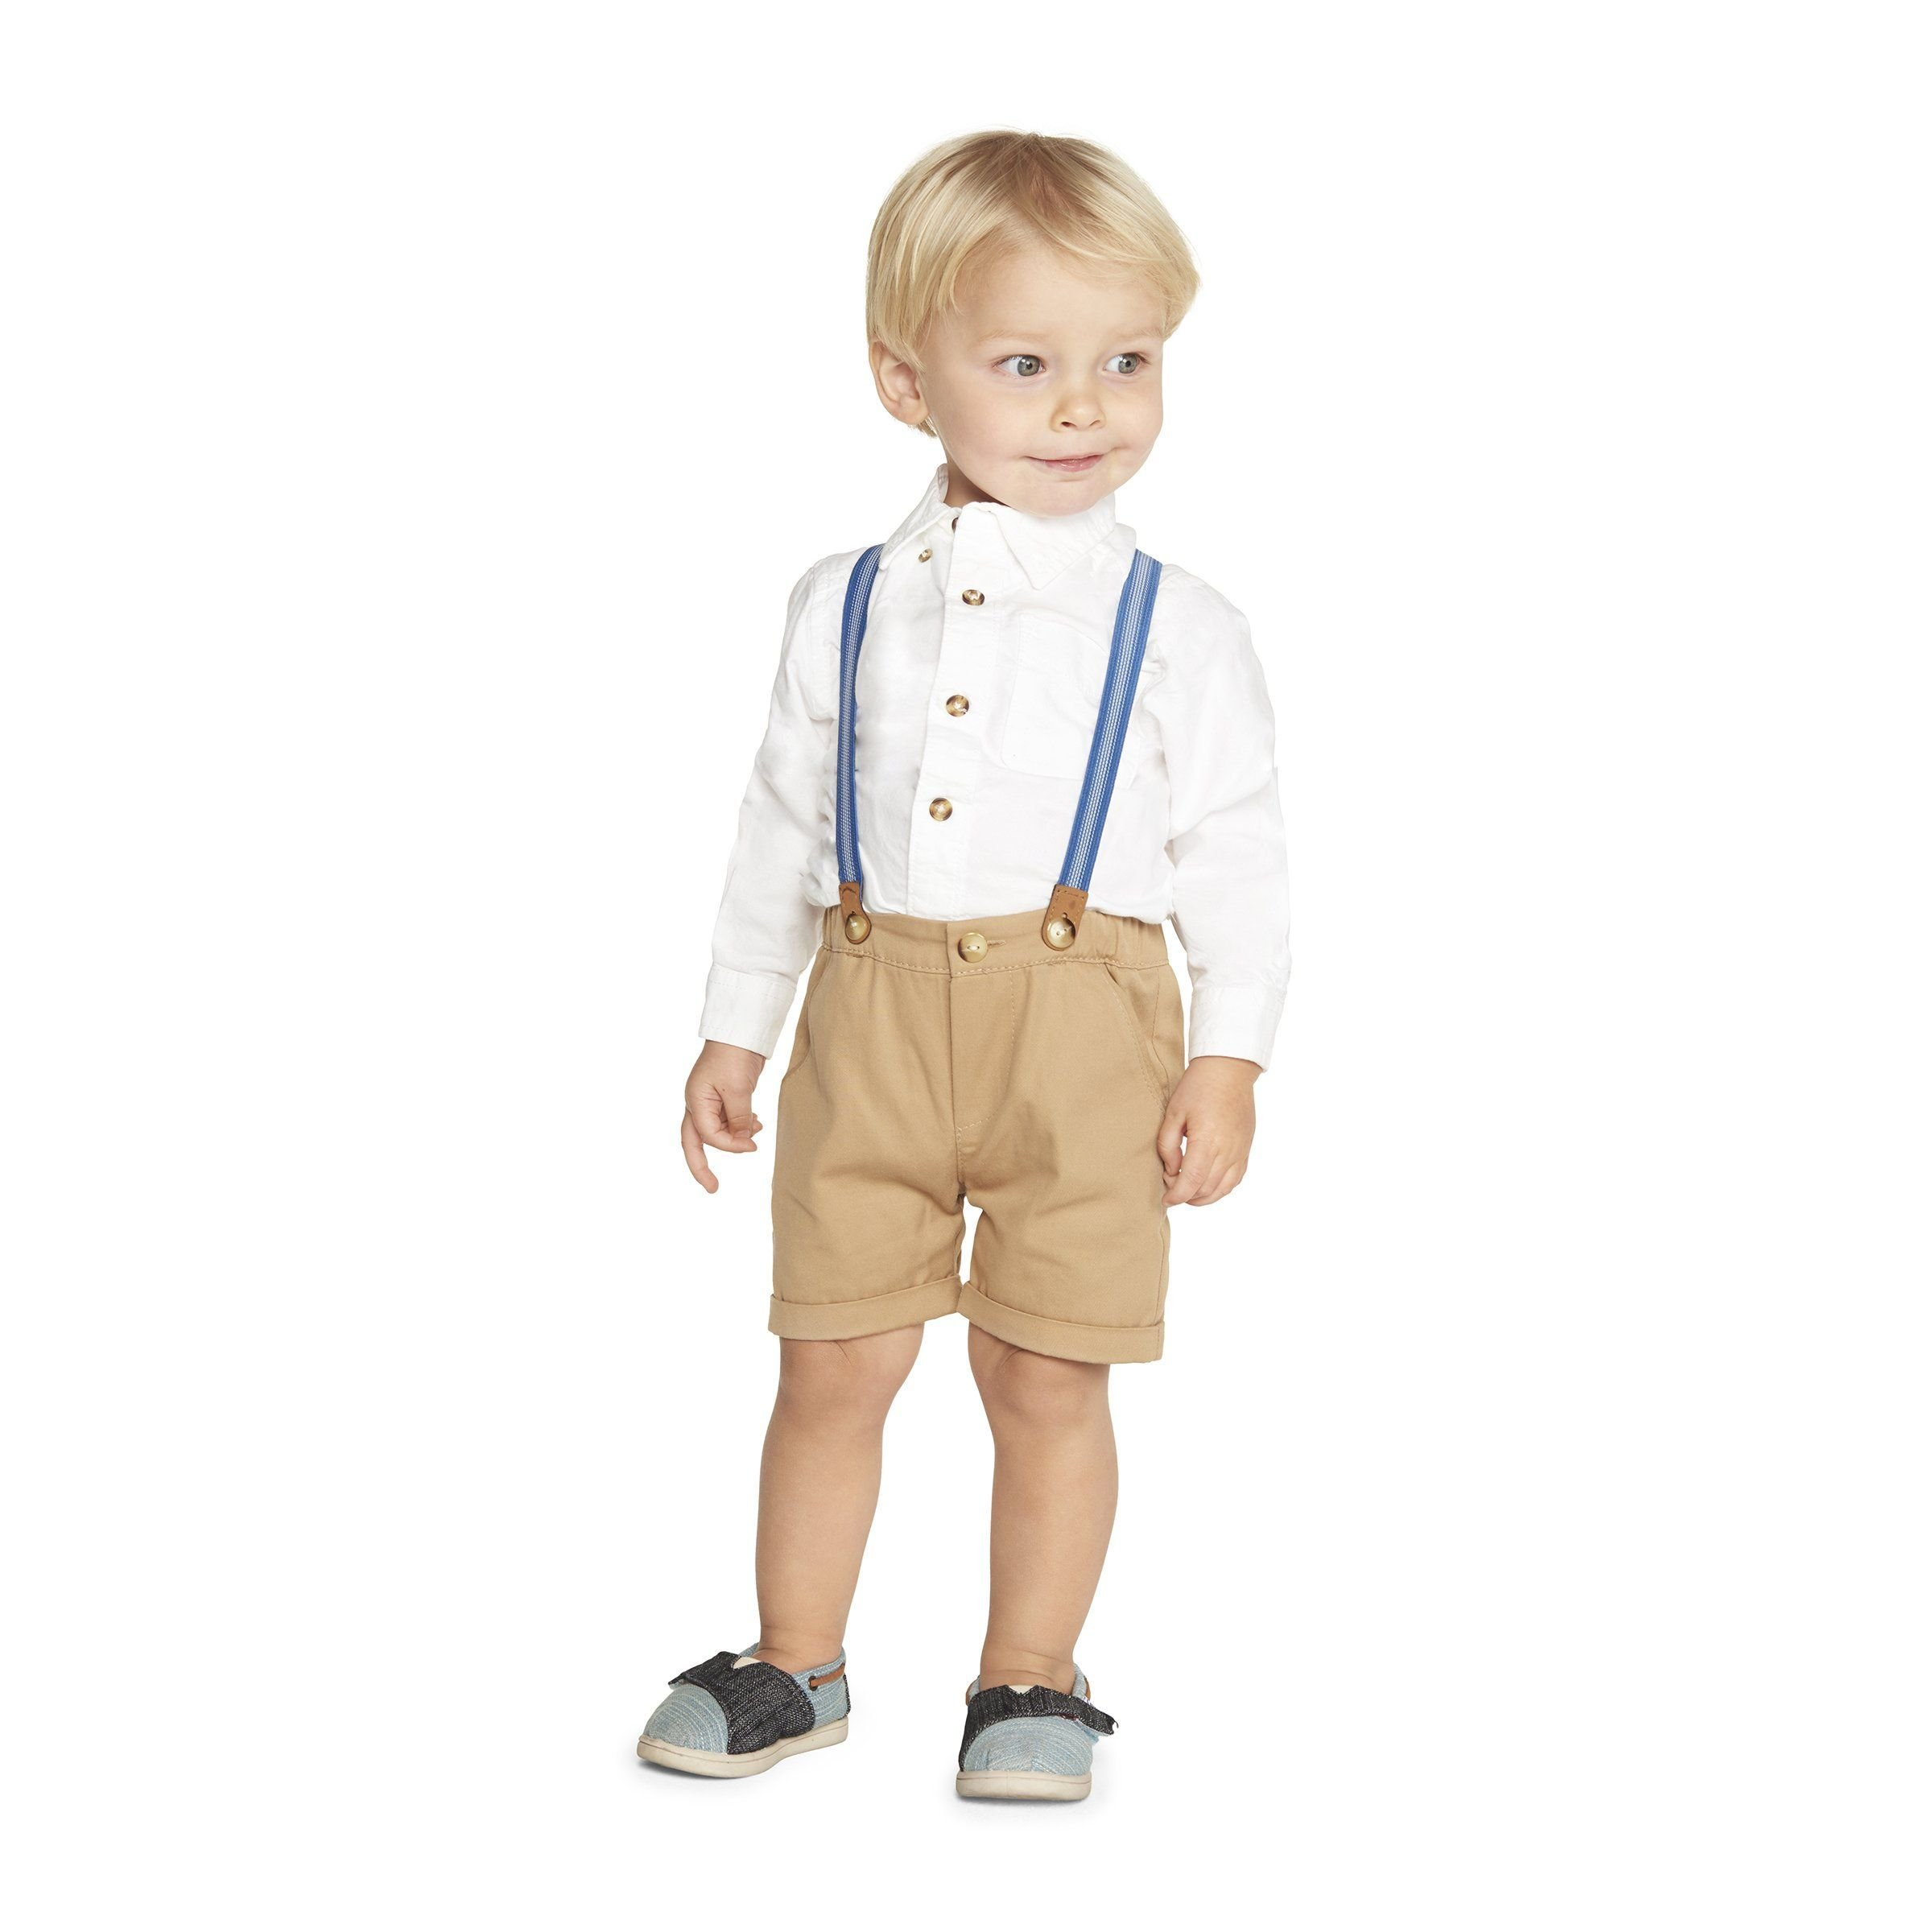 Little Brother Samuel Suspenders Set by PIPPA & JULIE (Image #4)